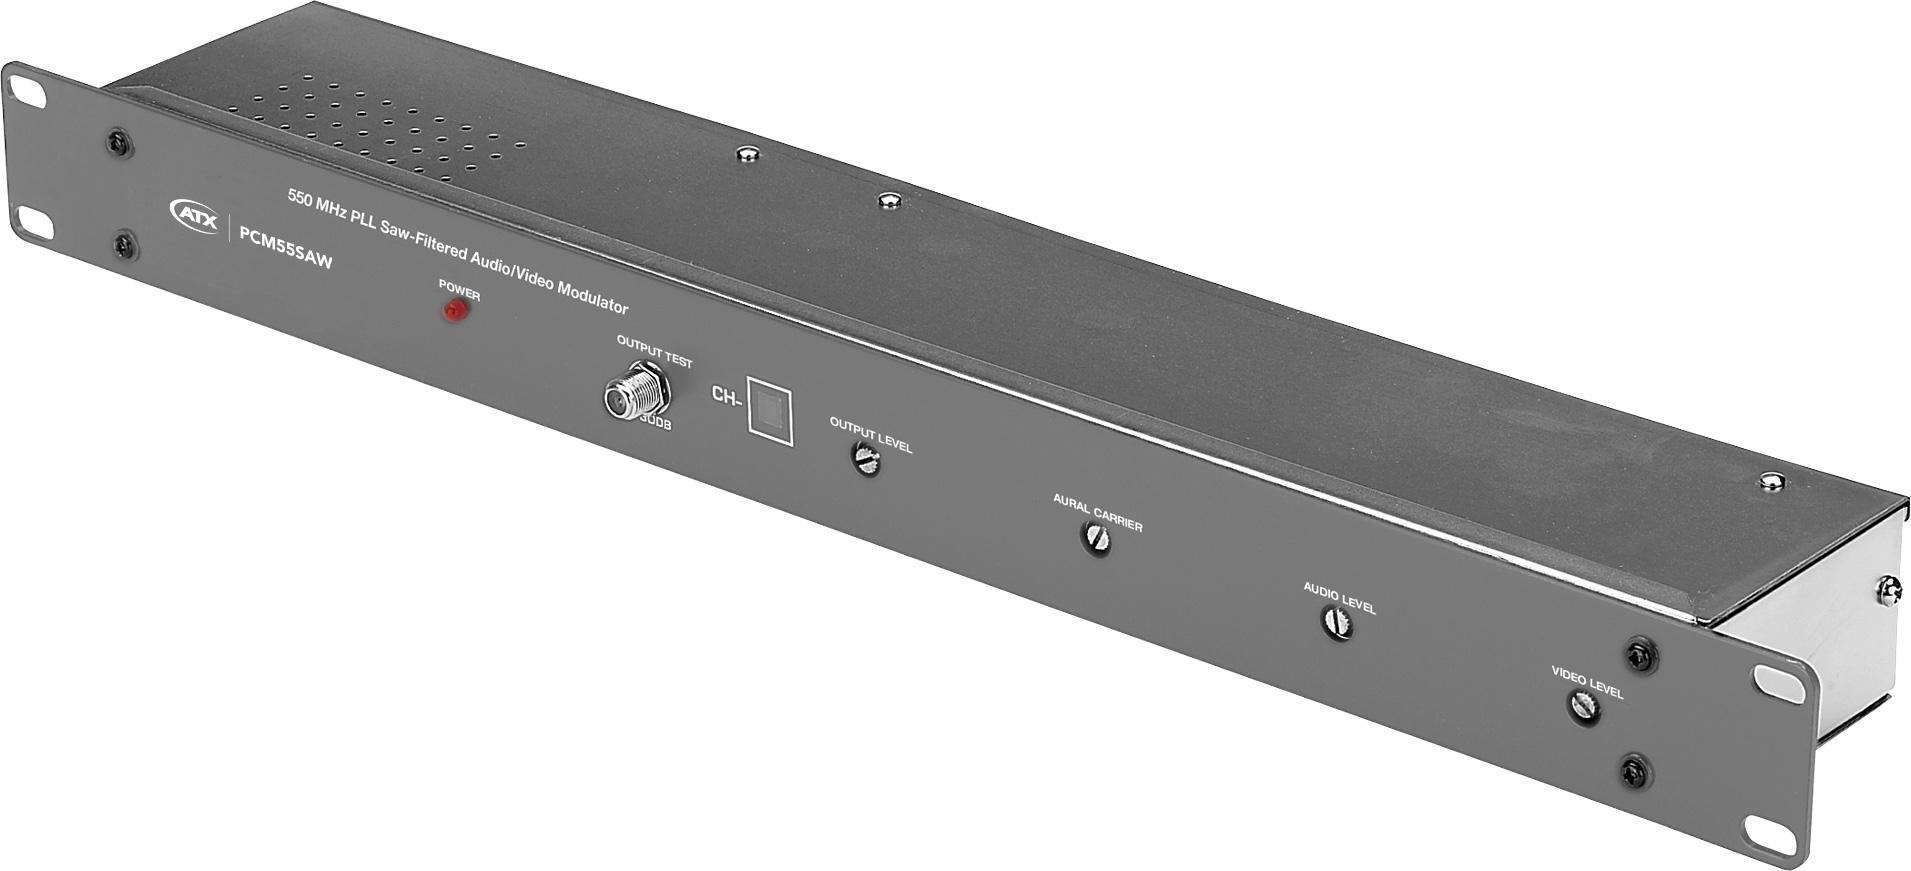 1 Channel Crystal A/V Modulator - Channel H (162-168) PM-PCM55SAW-H